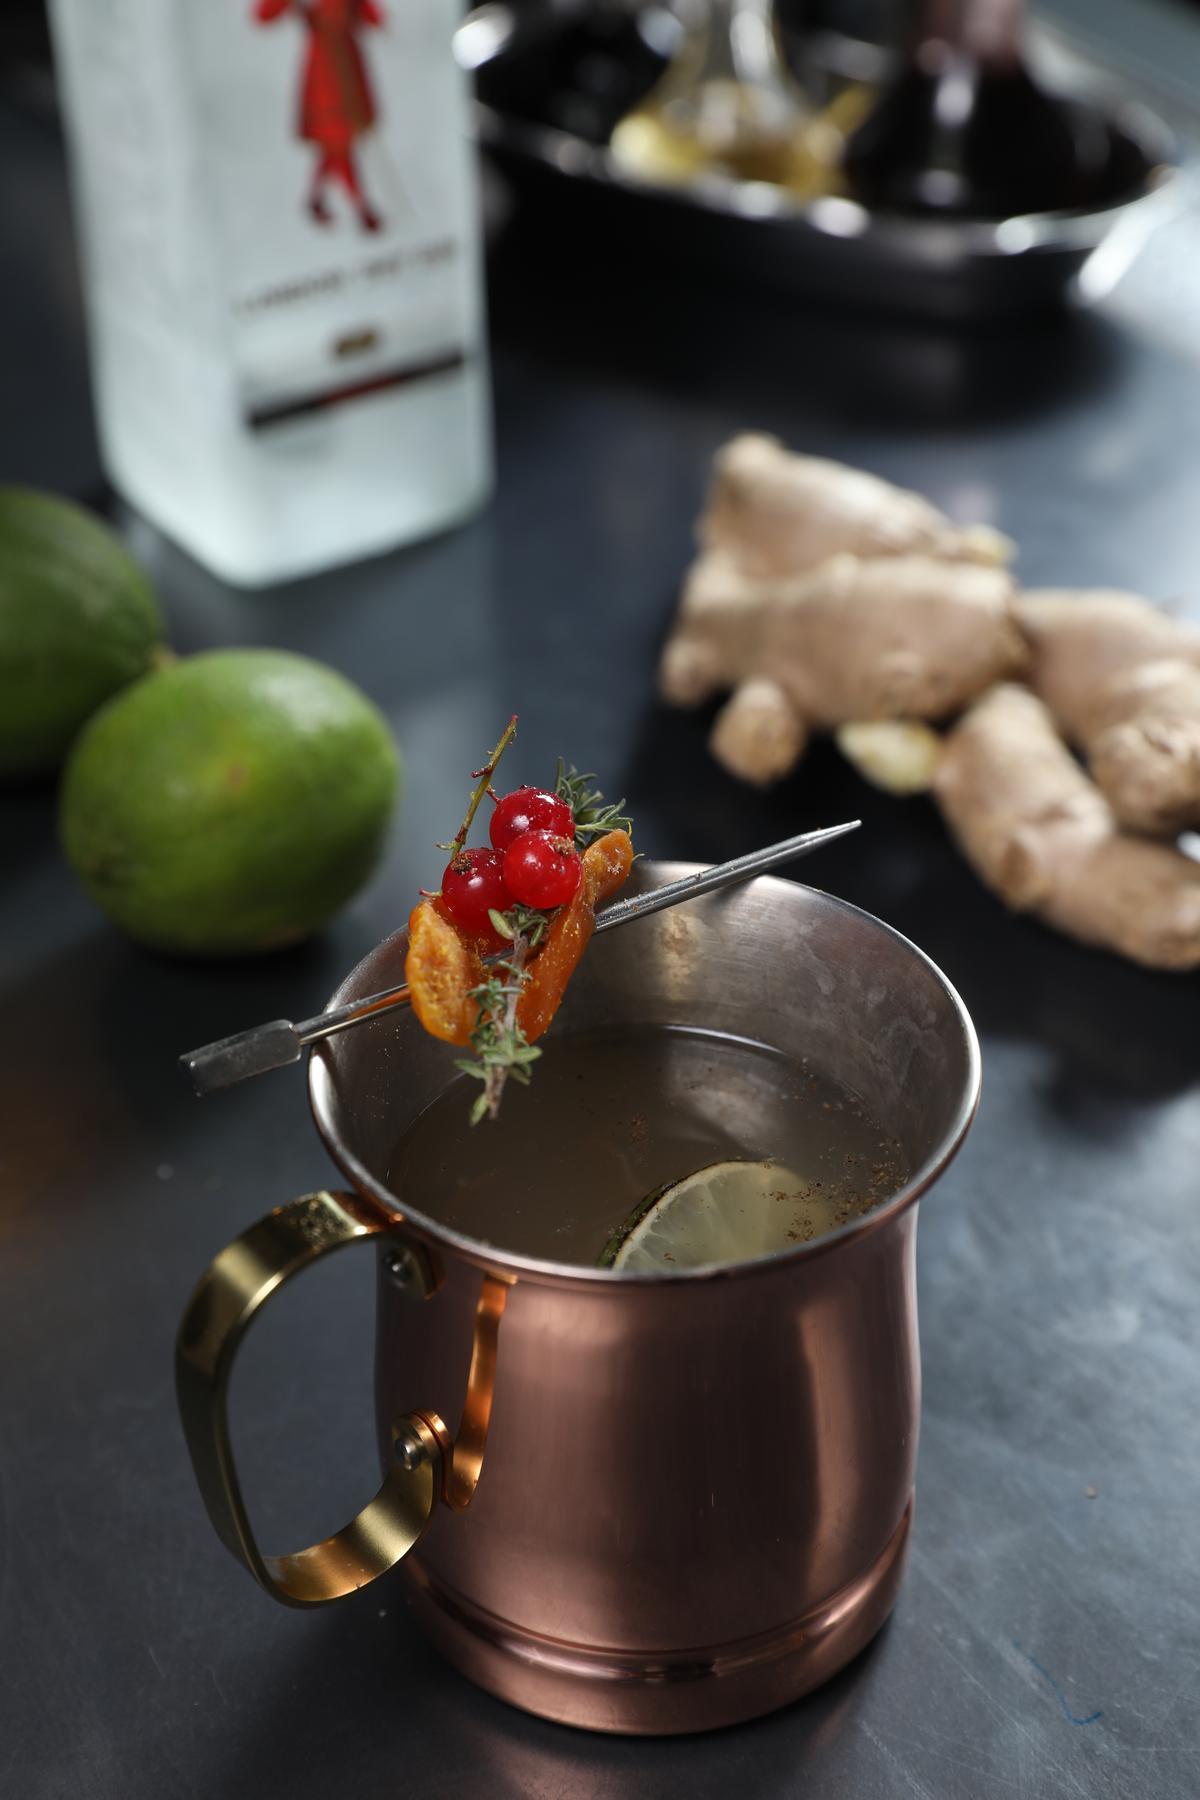 「Winter Mule」的配方簡單,香辛料和新鮮紅醋栗卻讓口感極為豐富。(400元/杯)